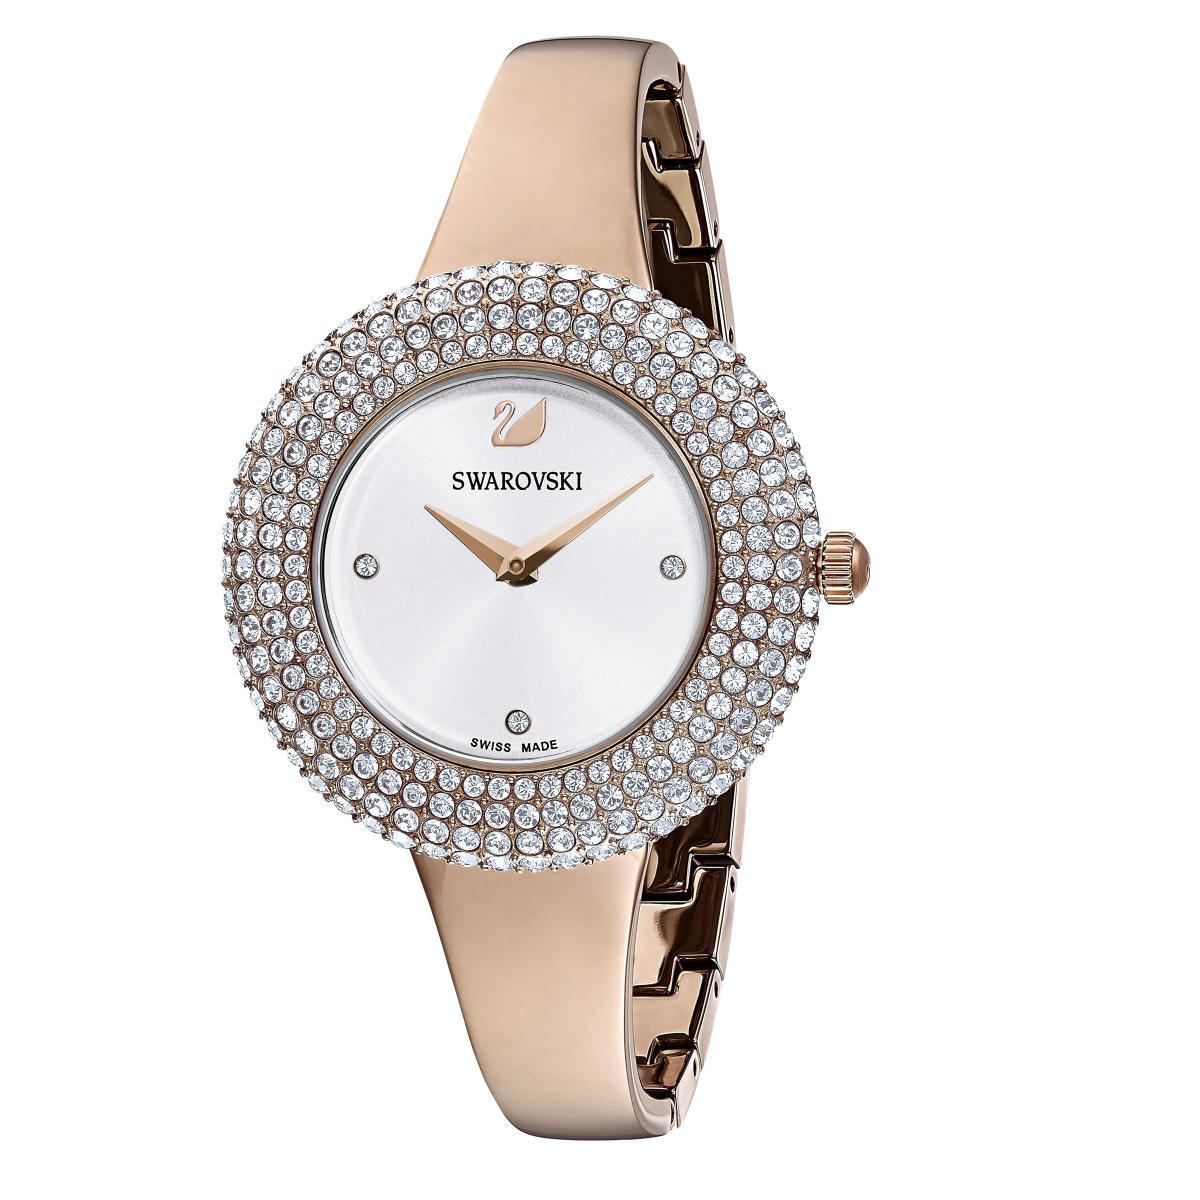 Montre Swarovski 5484073 - Crystal Rose Bracelet Jonc Acier Lunette Sertie En Micro-Pavé - Swarovski montres - Modalova